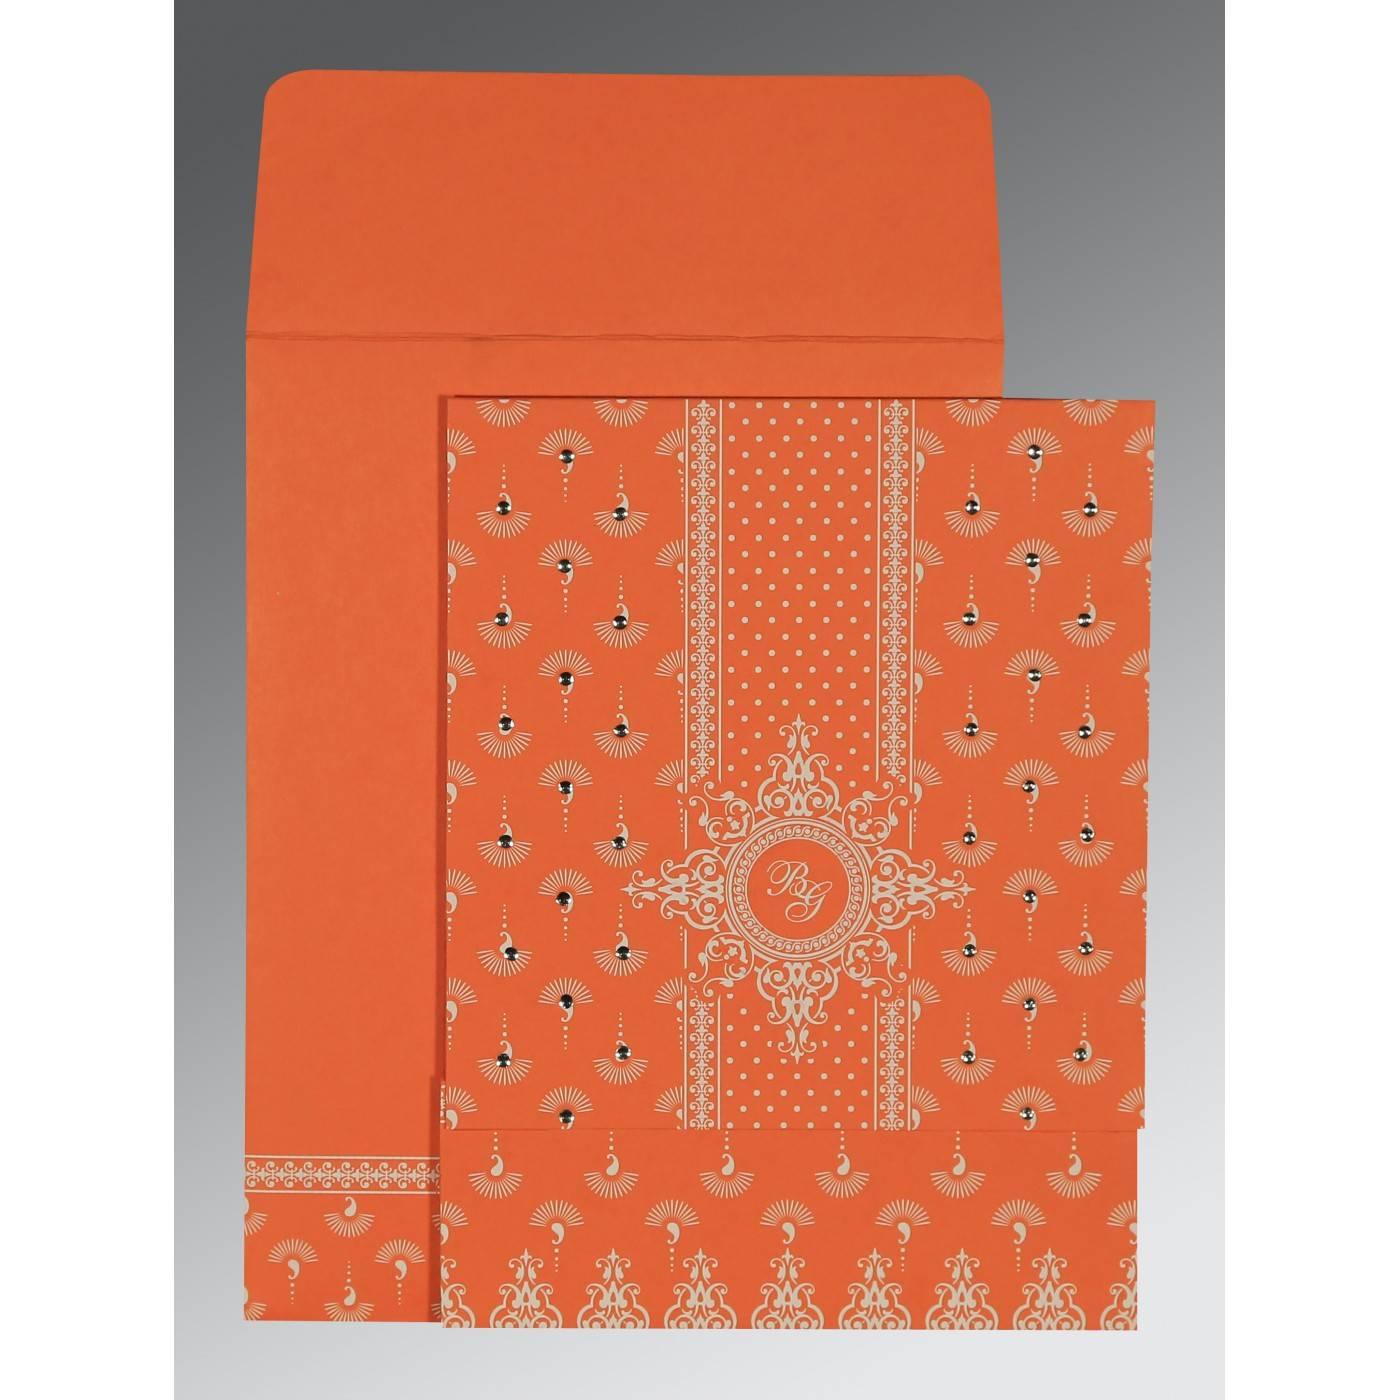 ORANGE MATTE SCREEN PRINTED WEDDING INVITATION : CRU-8247I - IndianWeddingCards